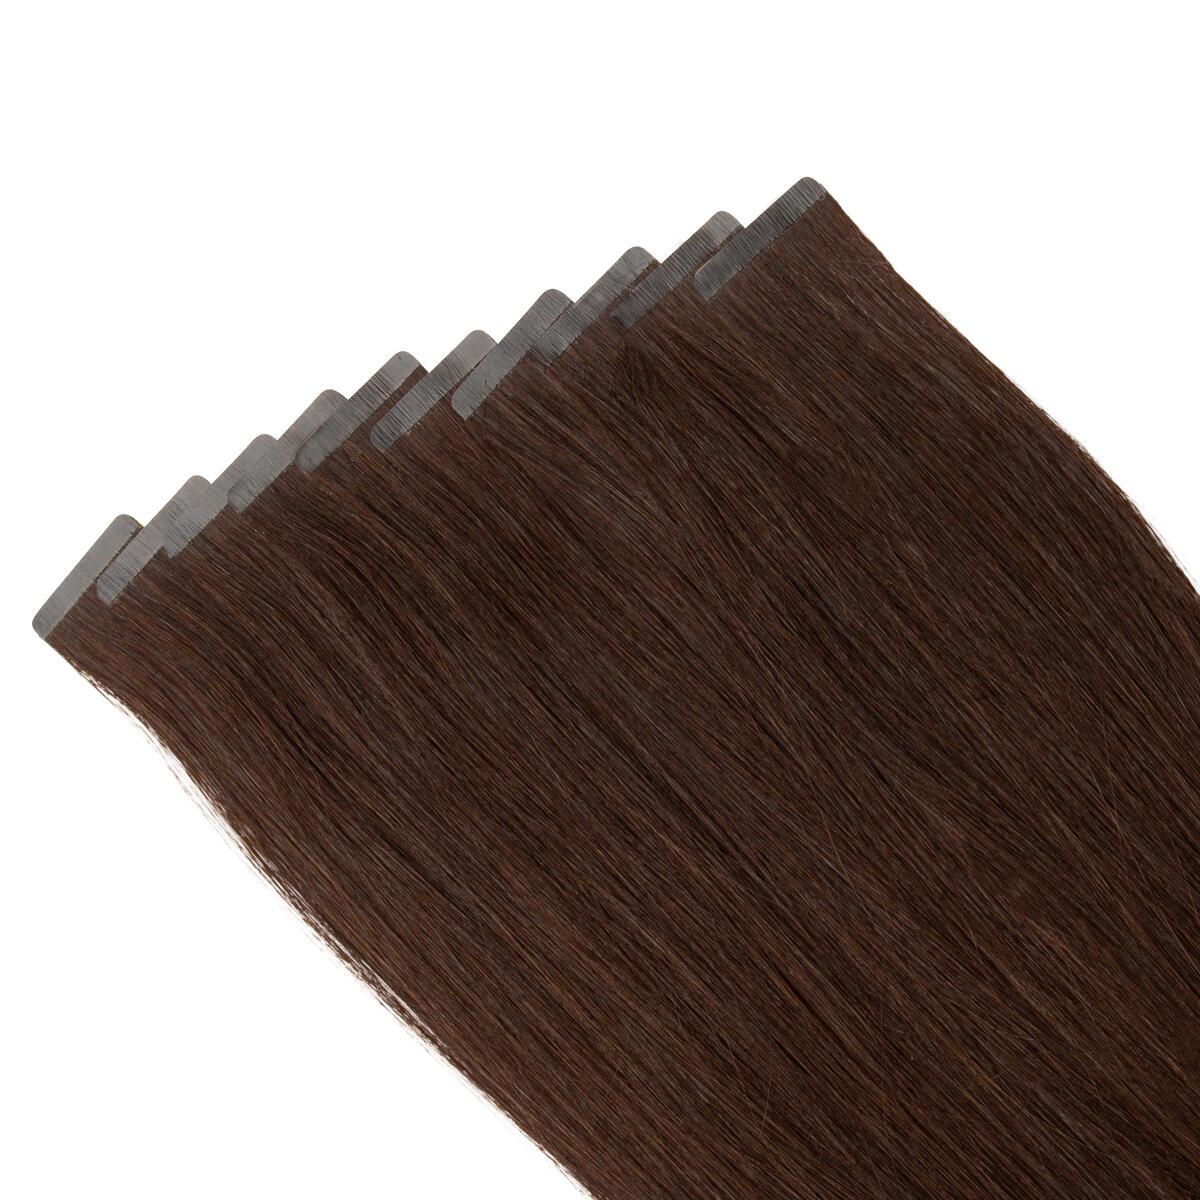 Sleek Tape Extension Premium 2.2 Coffee Brown 45 cm